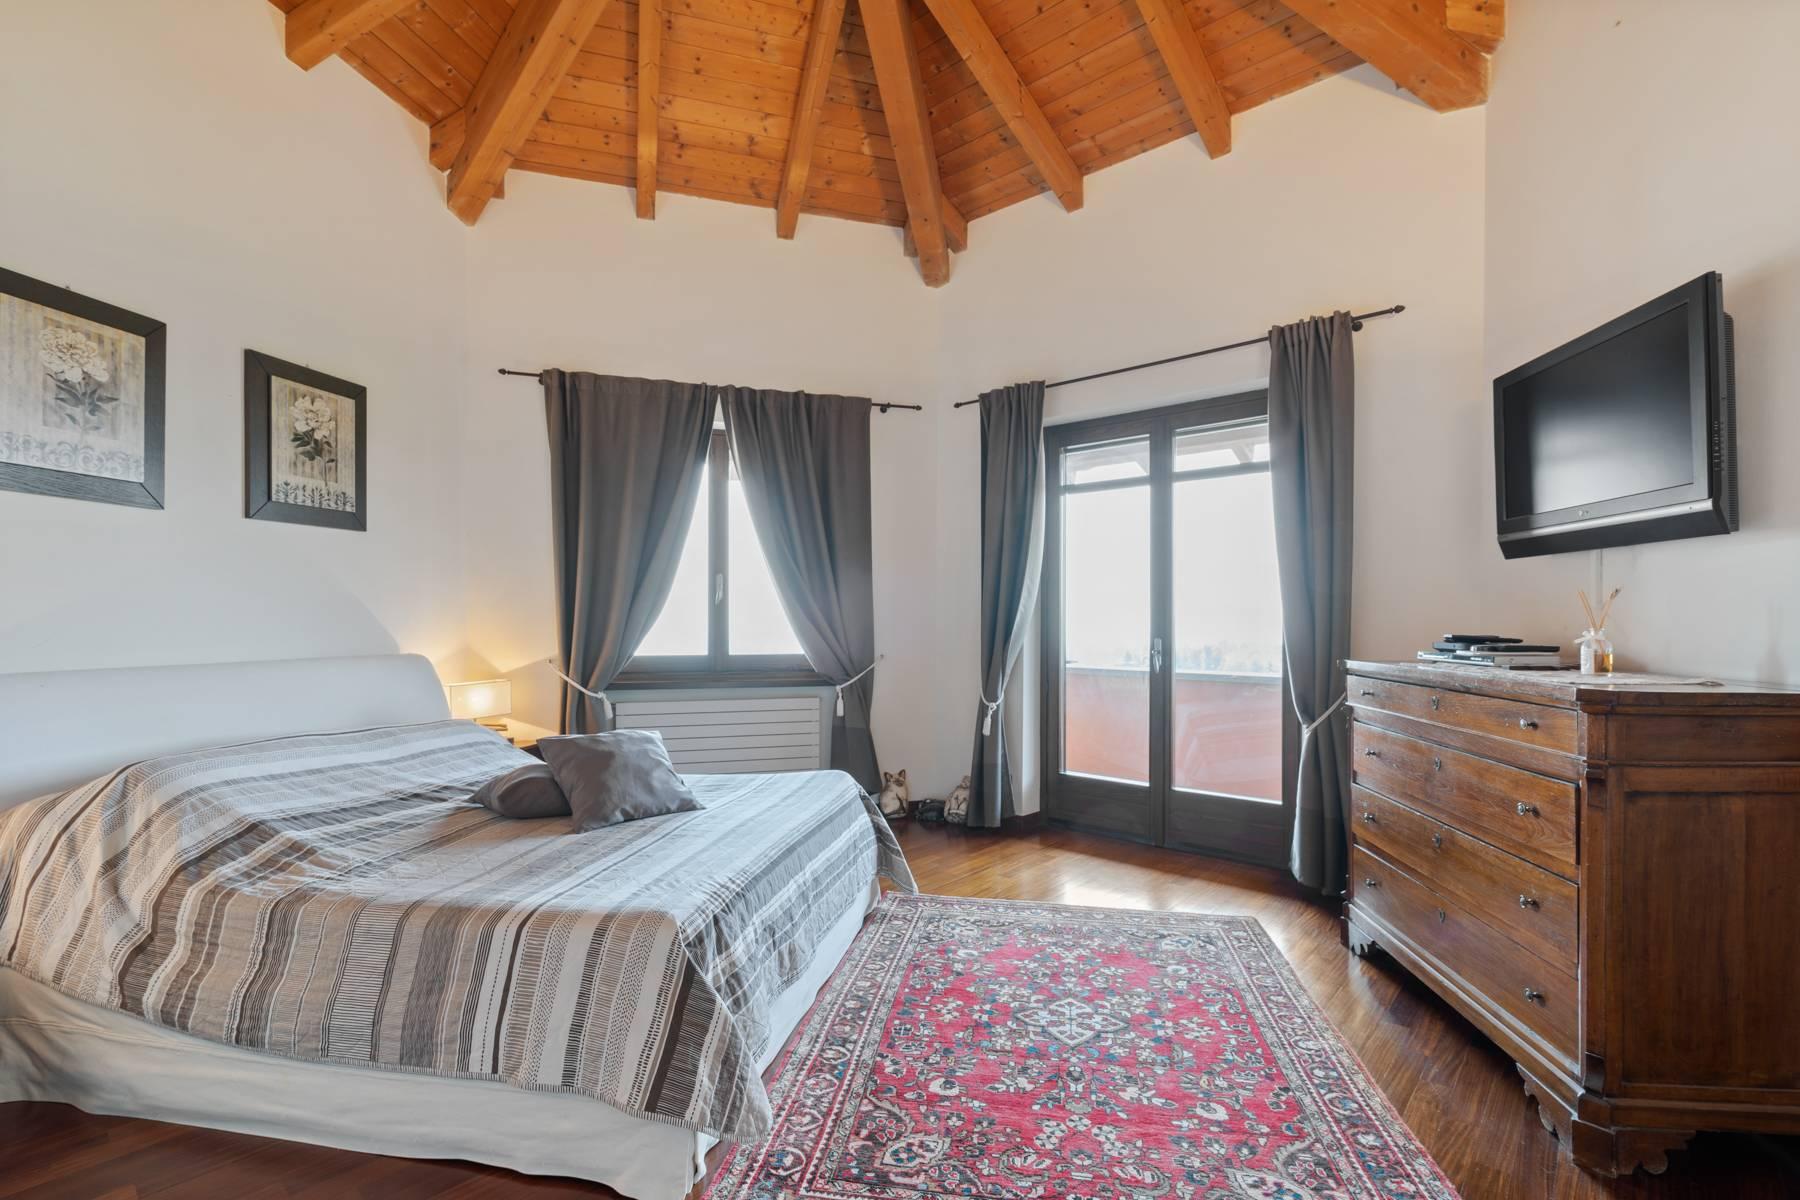 Villa in Vendita a Baldissero Torinese: 5 locali, 503 mq - Foto 12